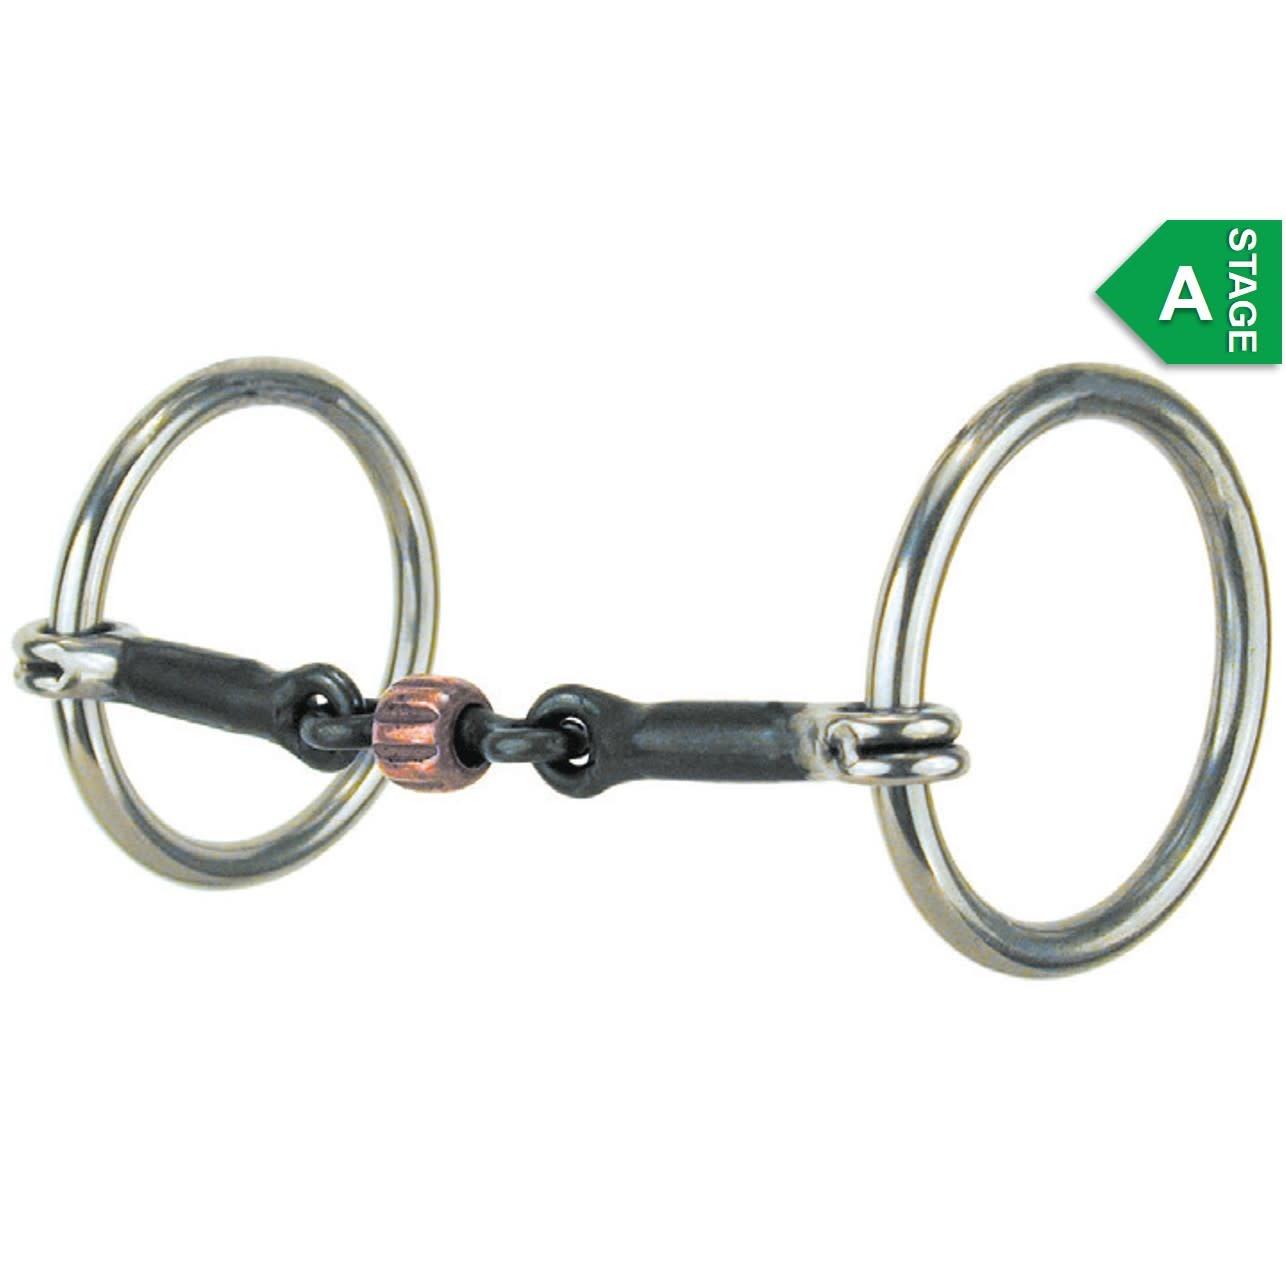 Reinsman Snaffle - Three-Piece Loose Ring